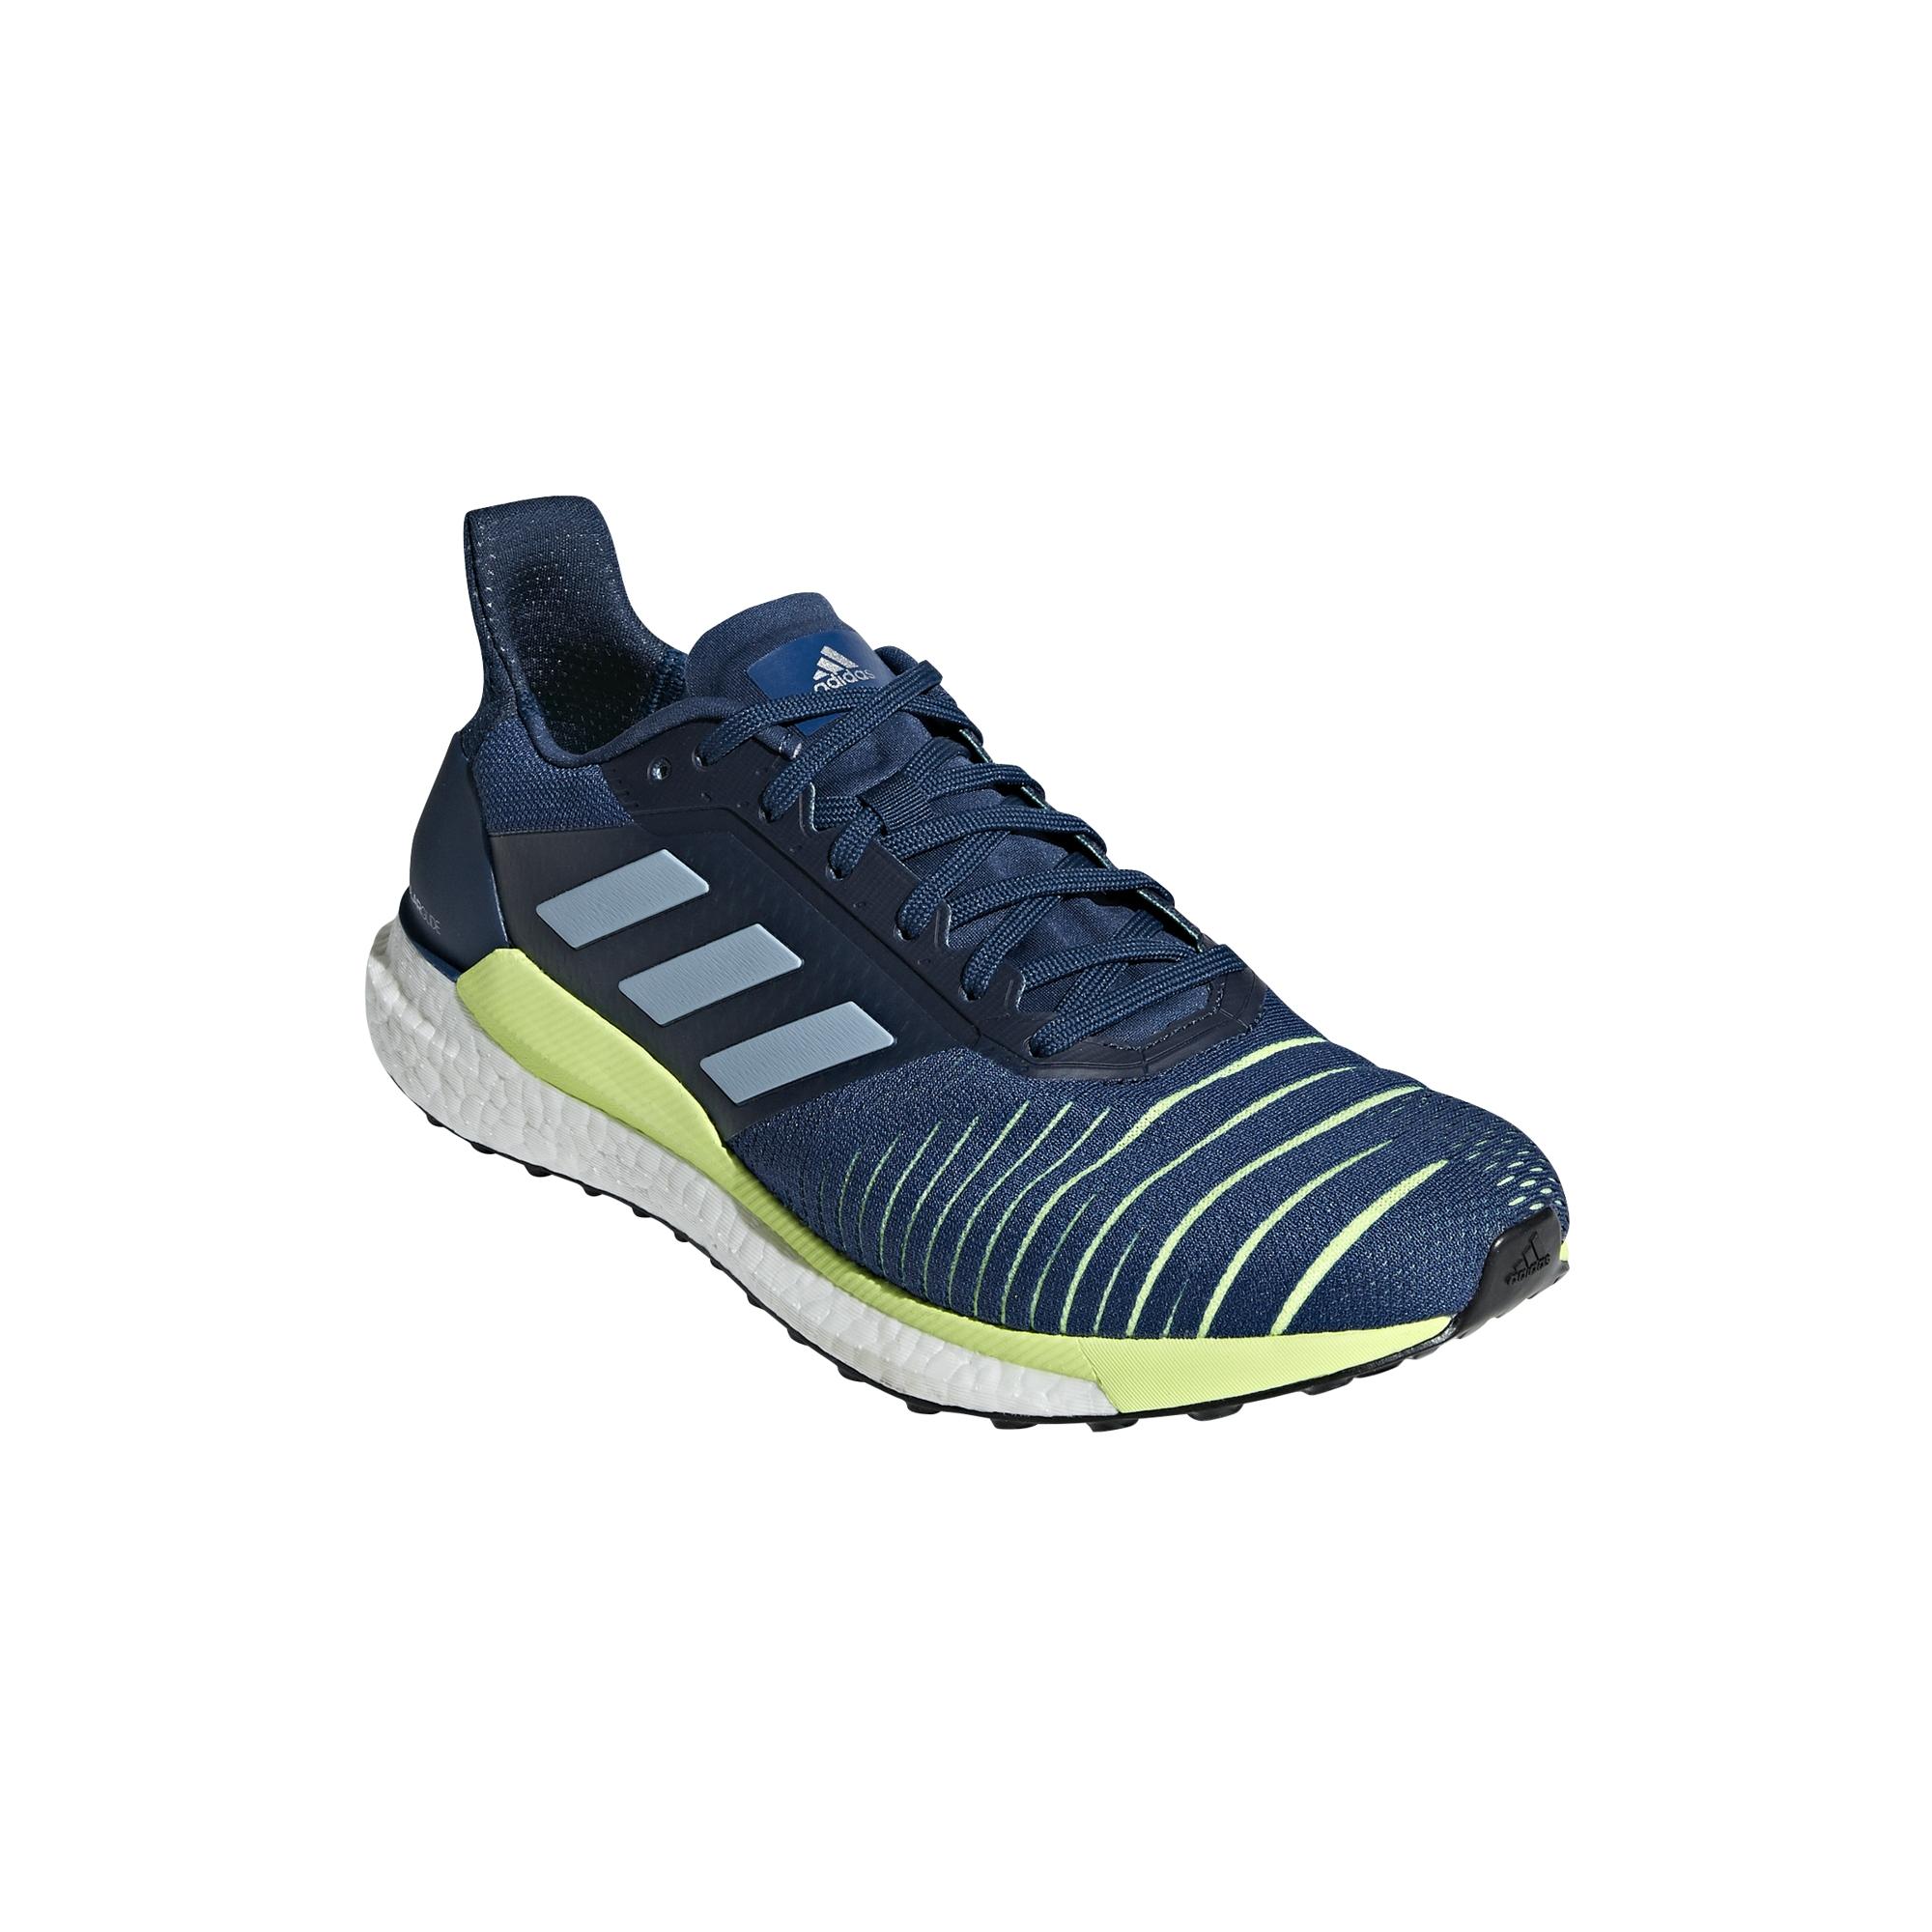 Solar Adidas Chaussures Chaussures Solar Chaussures Glide Adidas Chaussures Glide Adidas Solar Glide 0OwN8ymvn